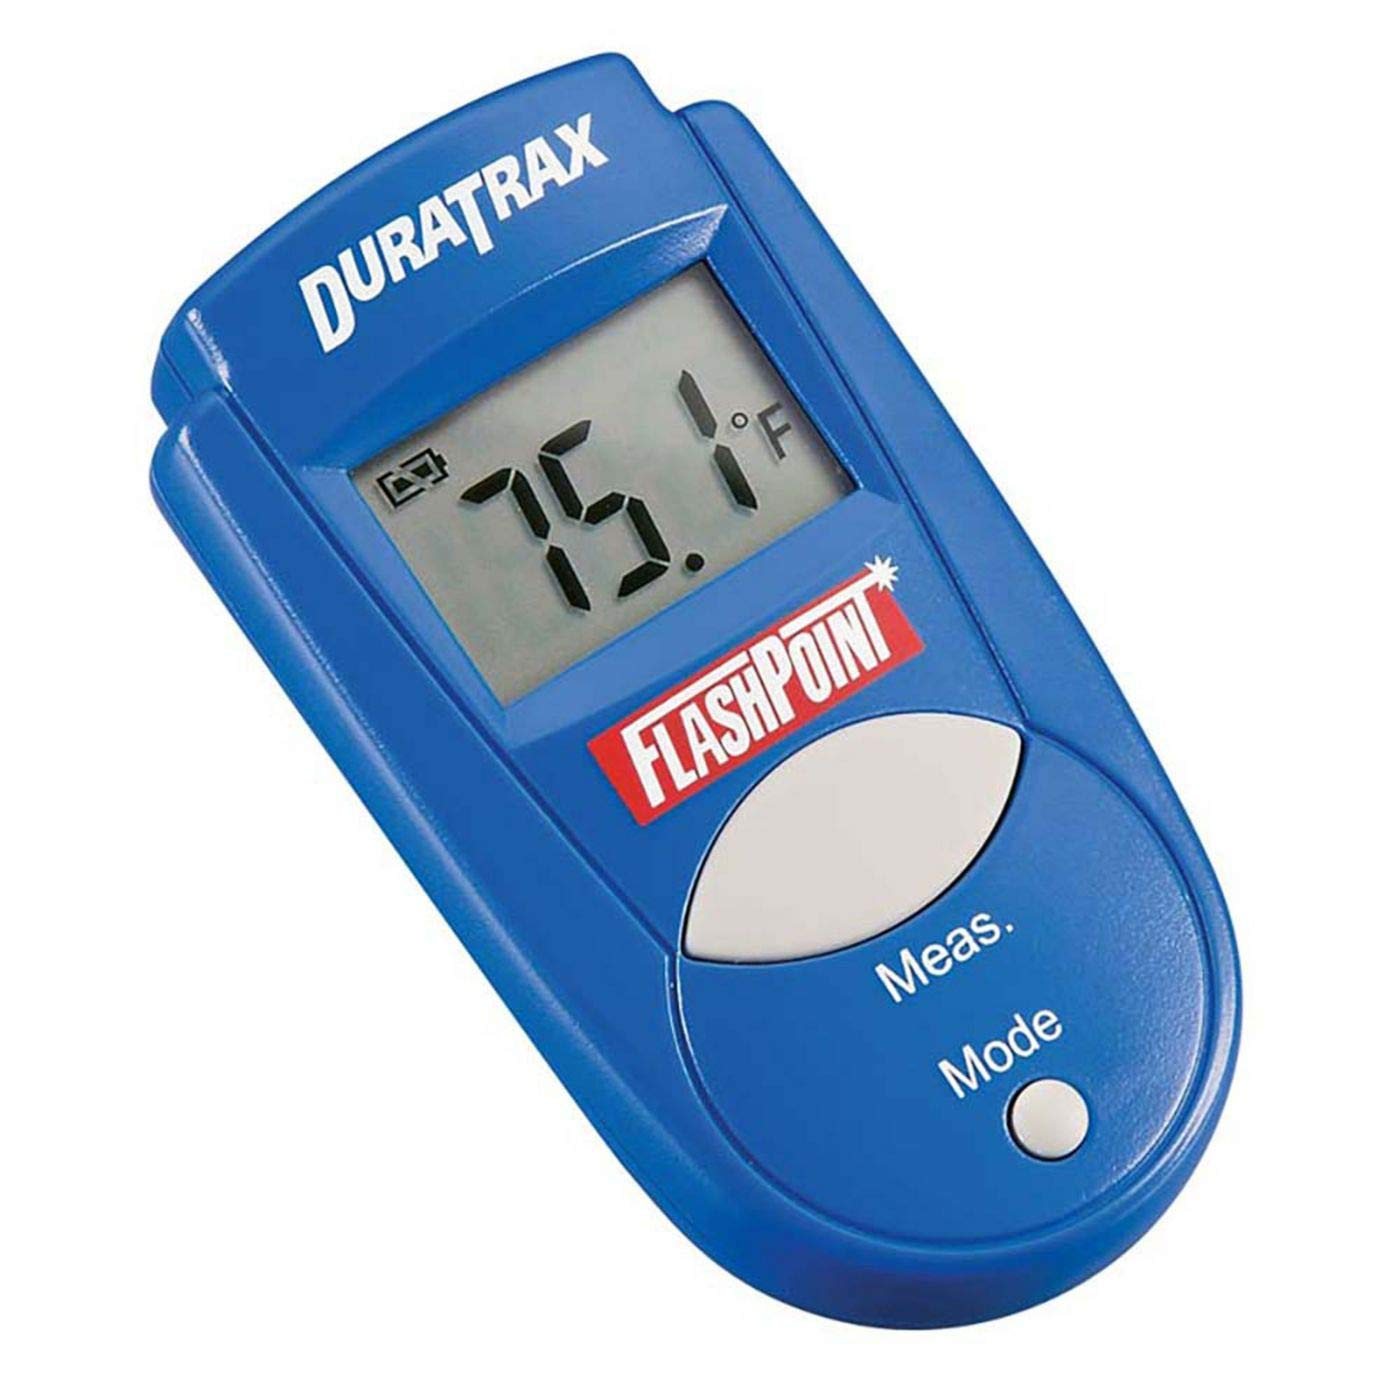 Duratrax Flashpoint Infrared Temperature Gauge by DuraTrax